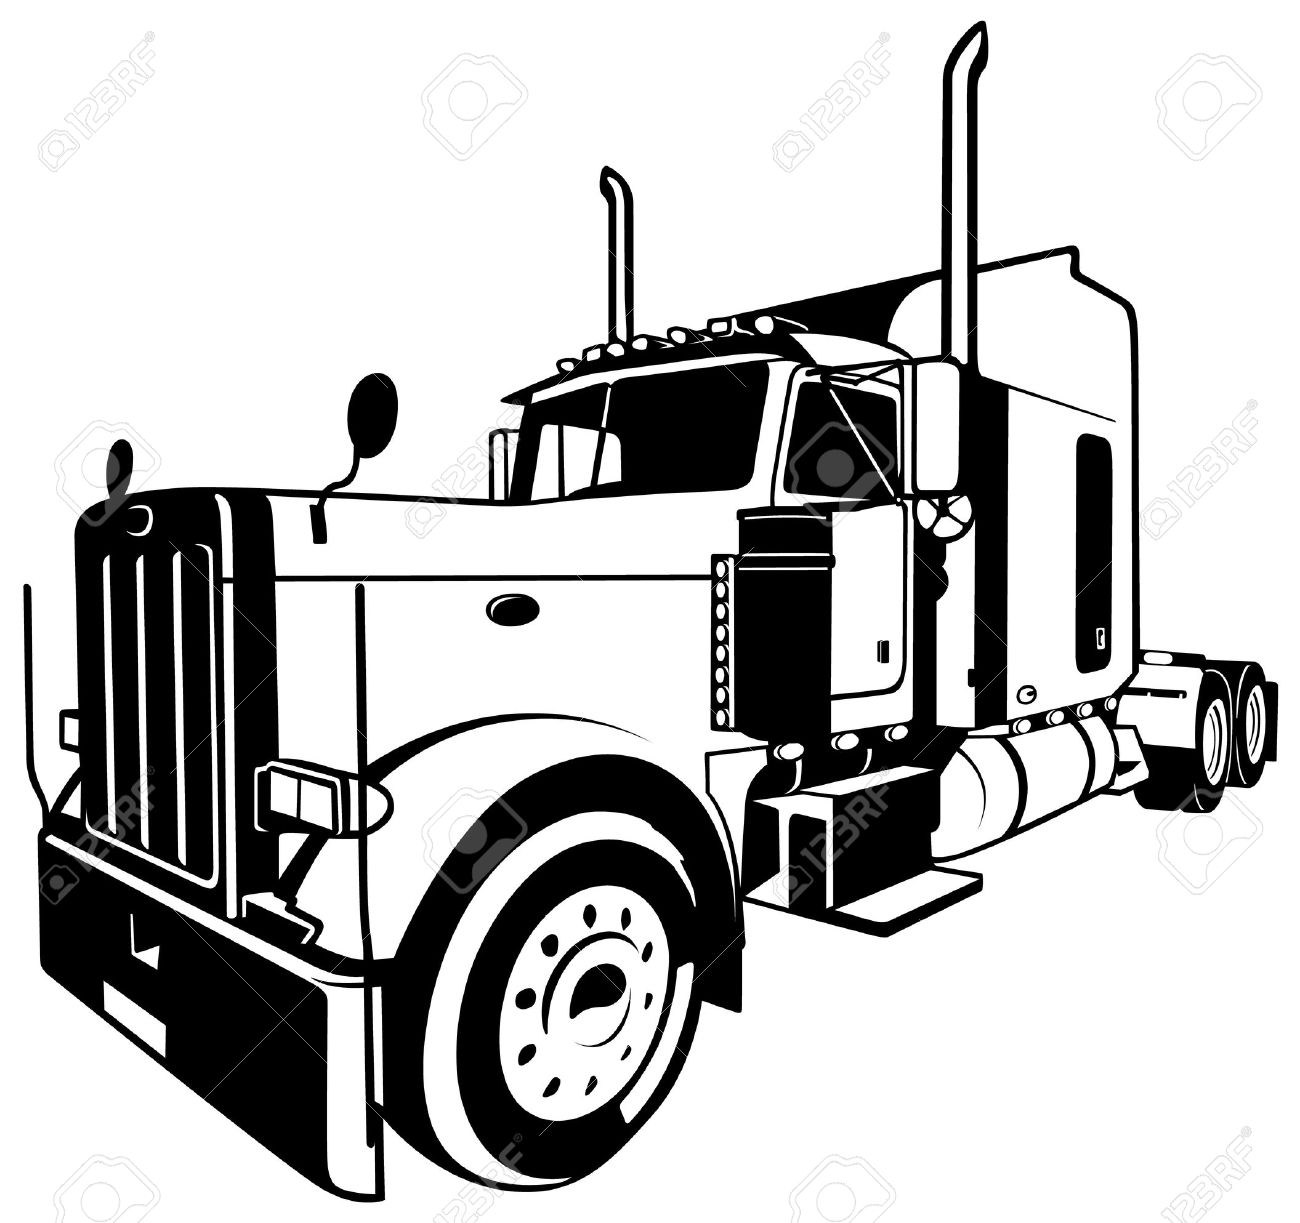 Semi truck vector Elegant Semi Truck Clipart Black And White.